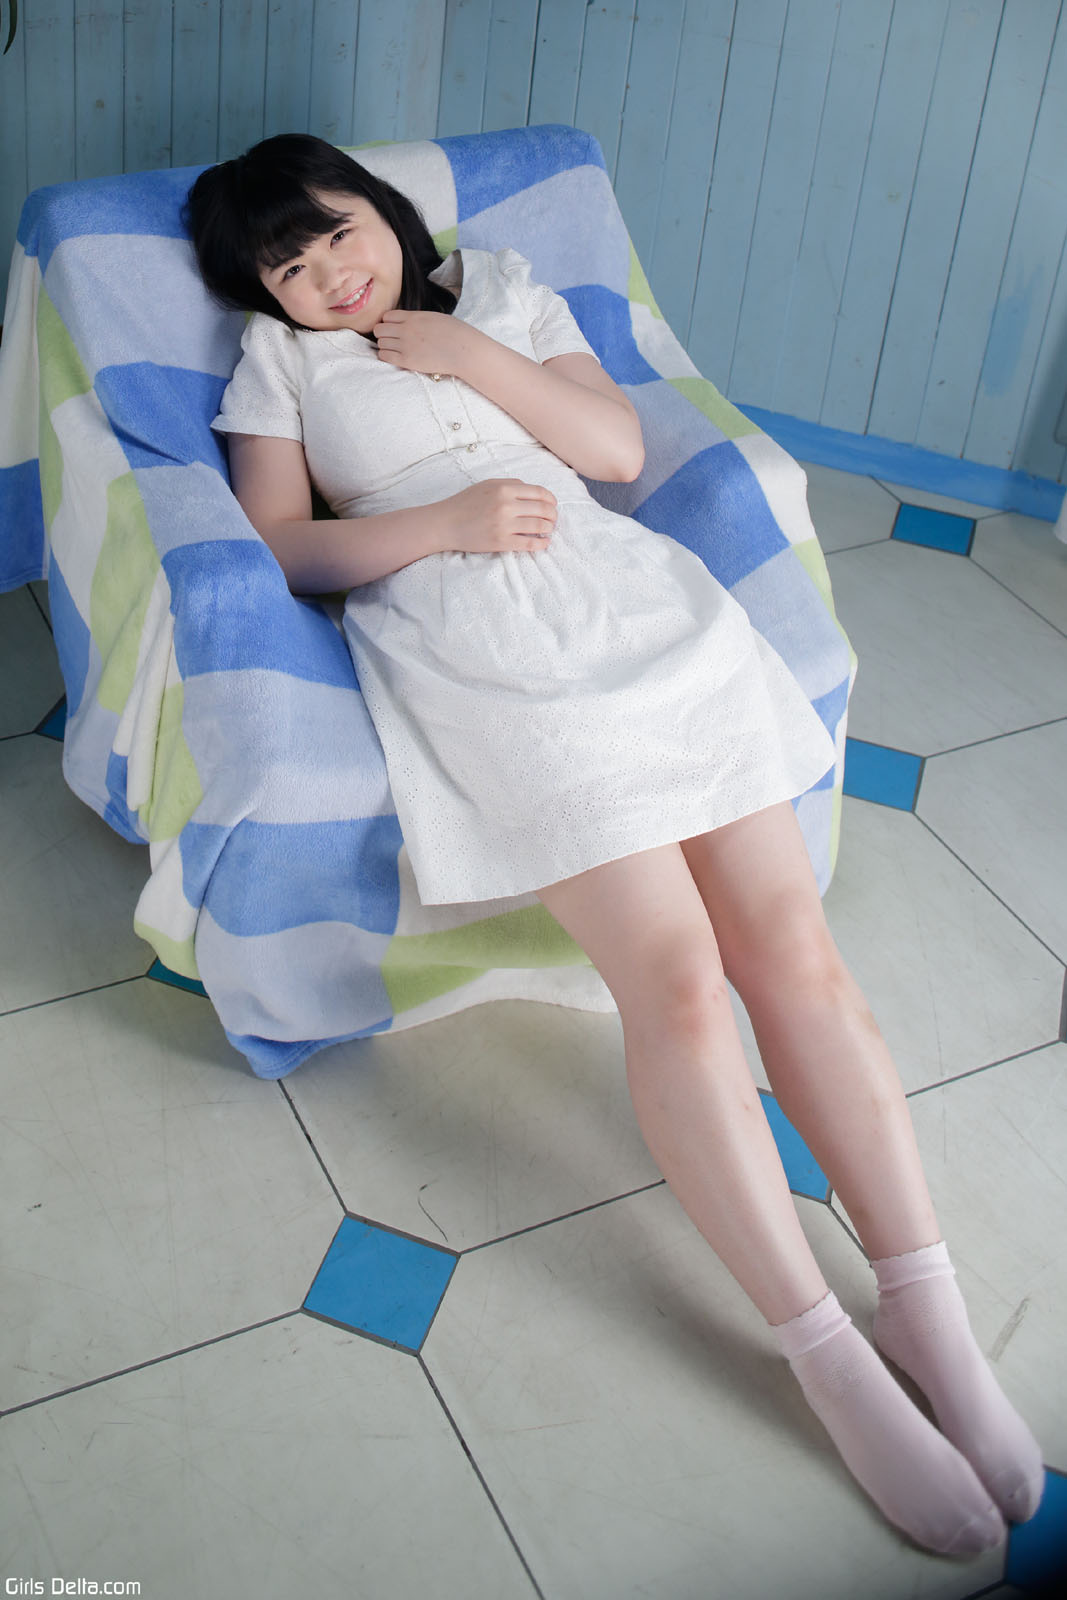 Girls Delta - Azumi Takayama